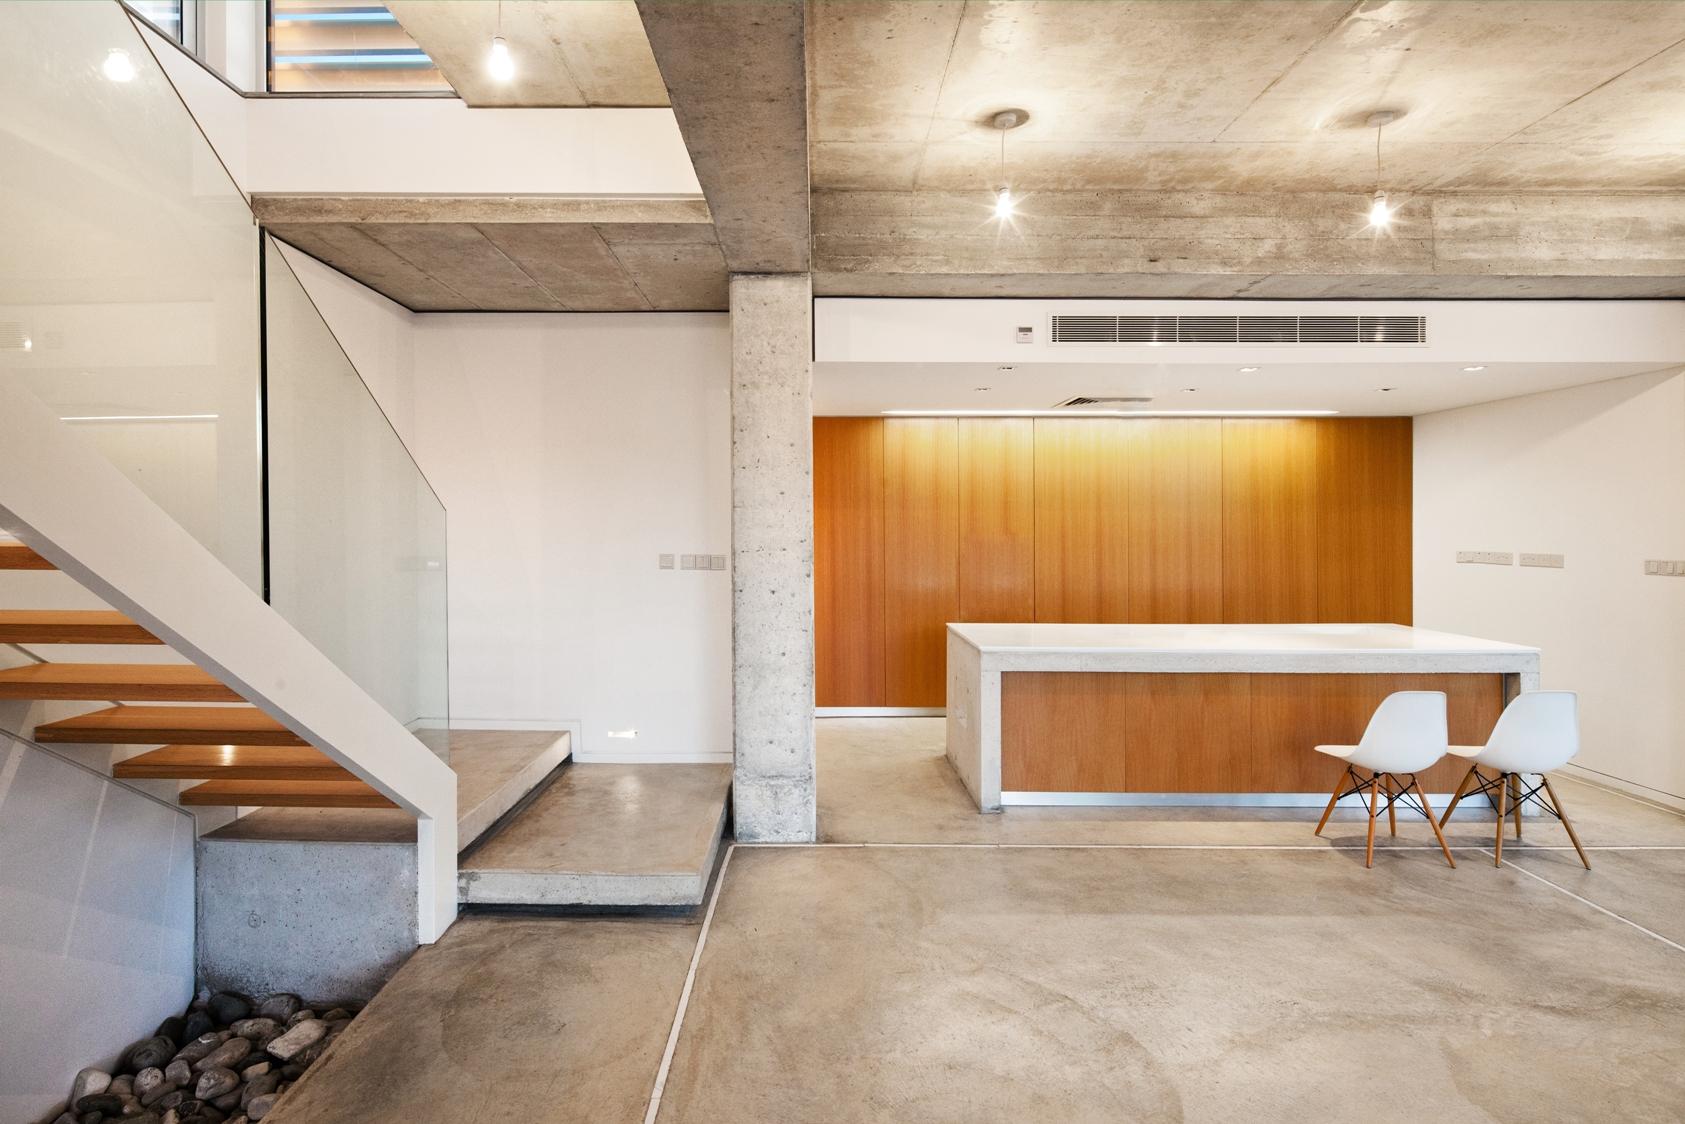 George Michael Residence in Peyia, Cyprus by Vardastudio Architects